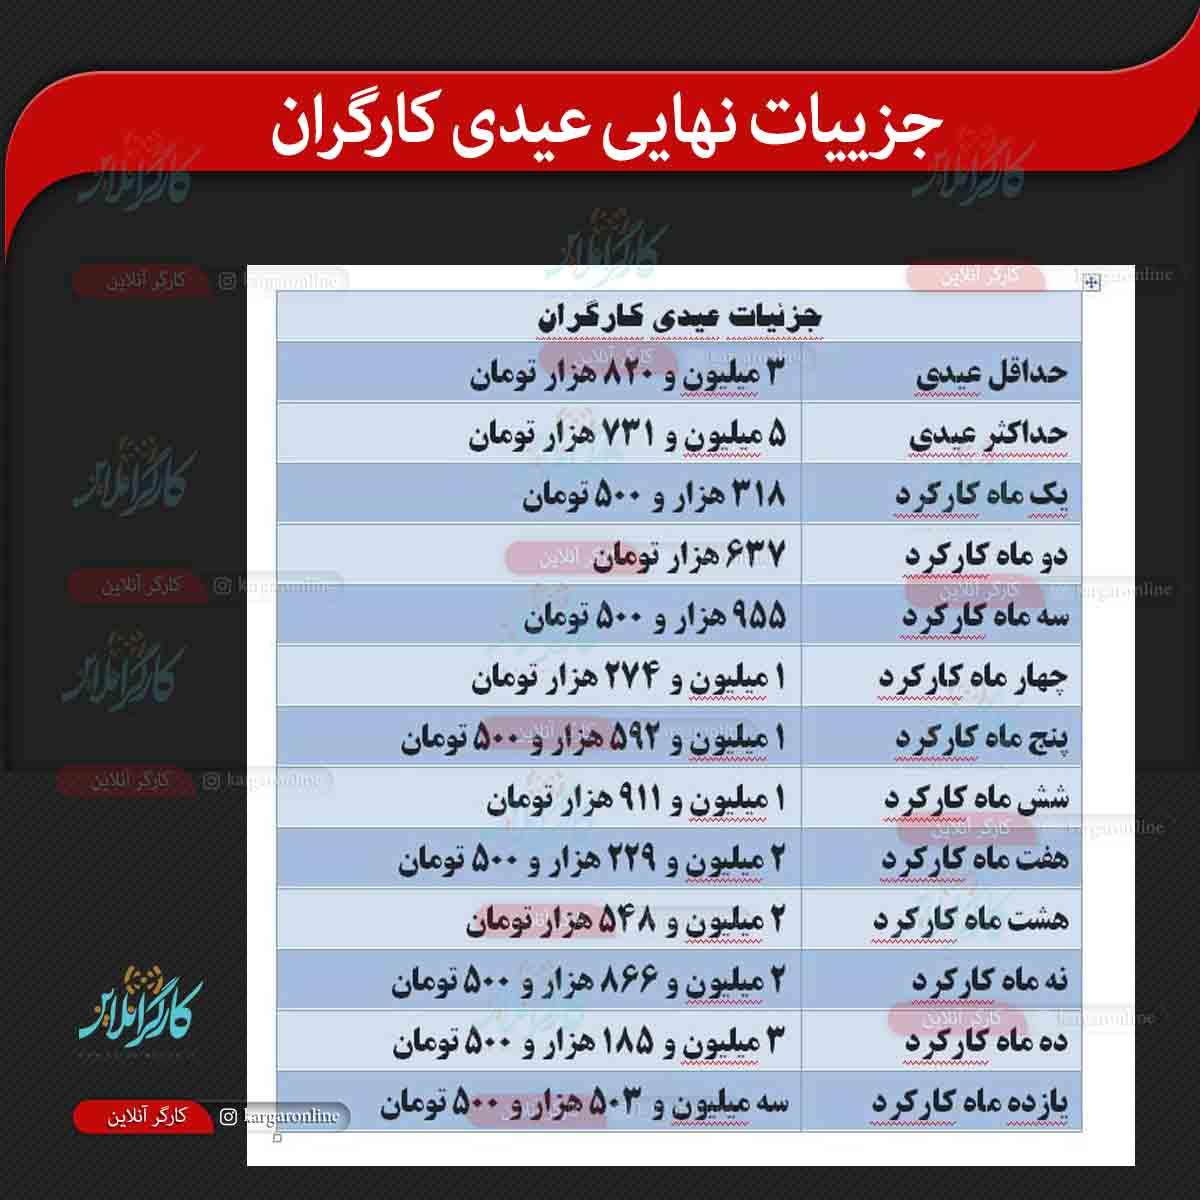 تفکیک عیدی کارگران اعلام شد+جدول